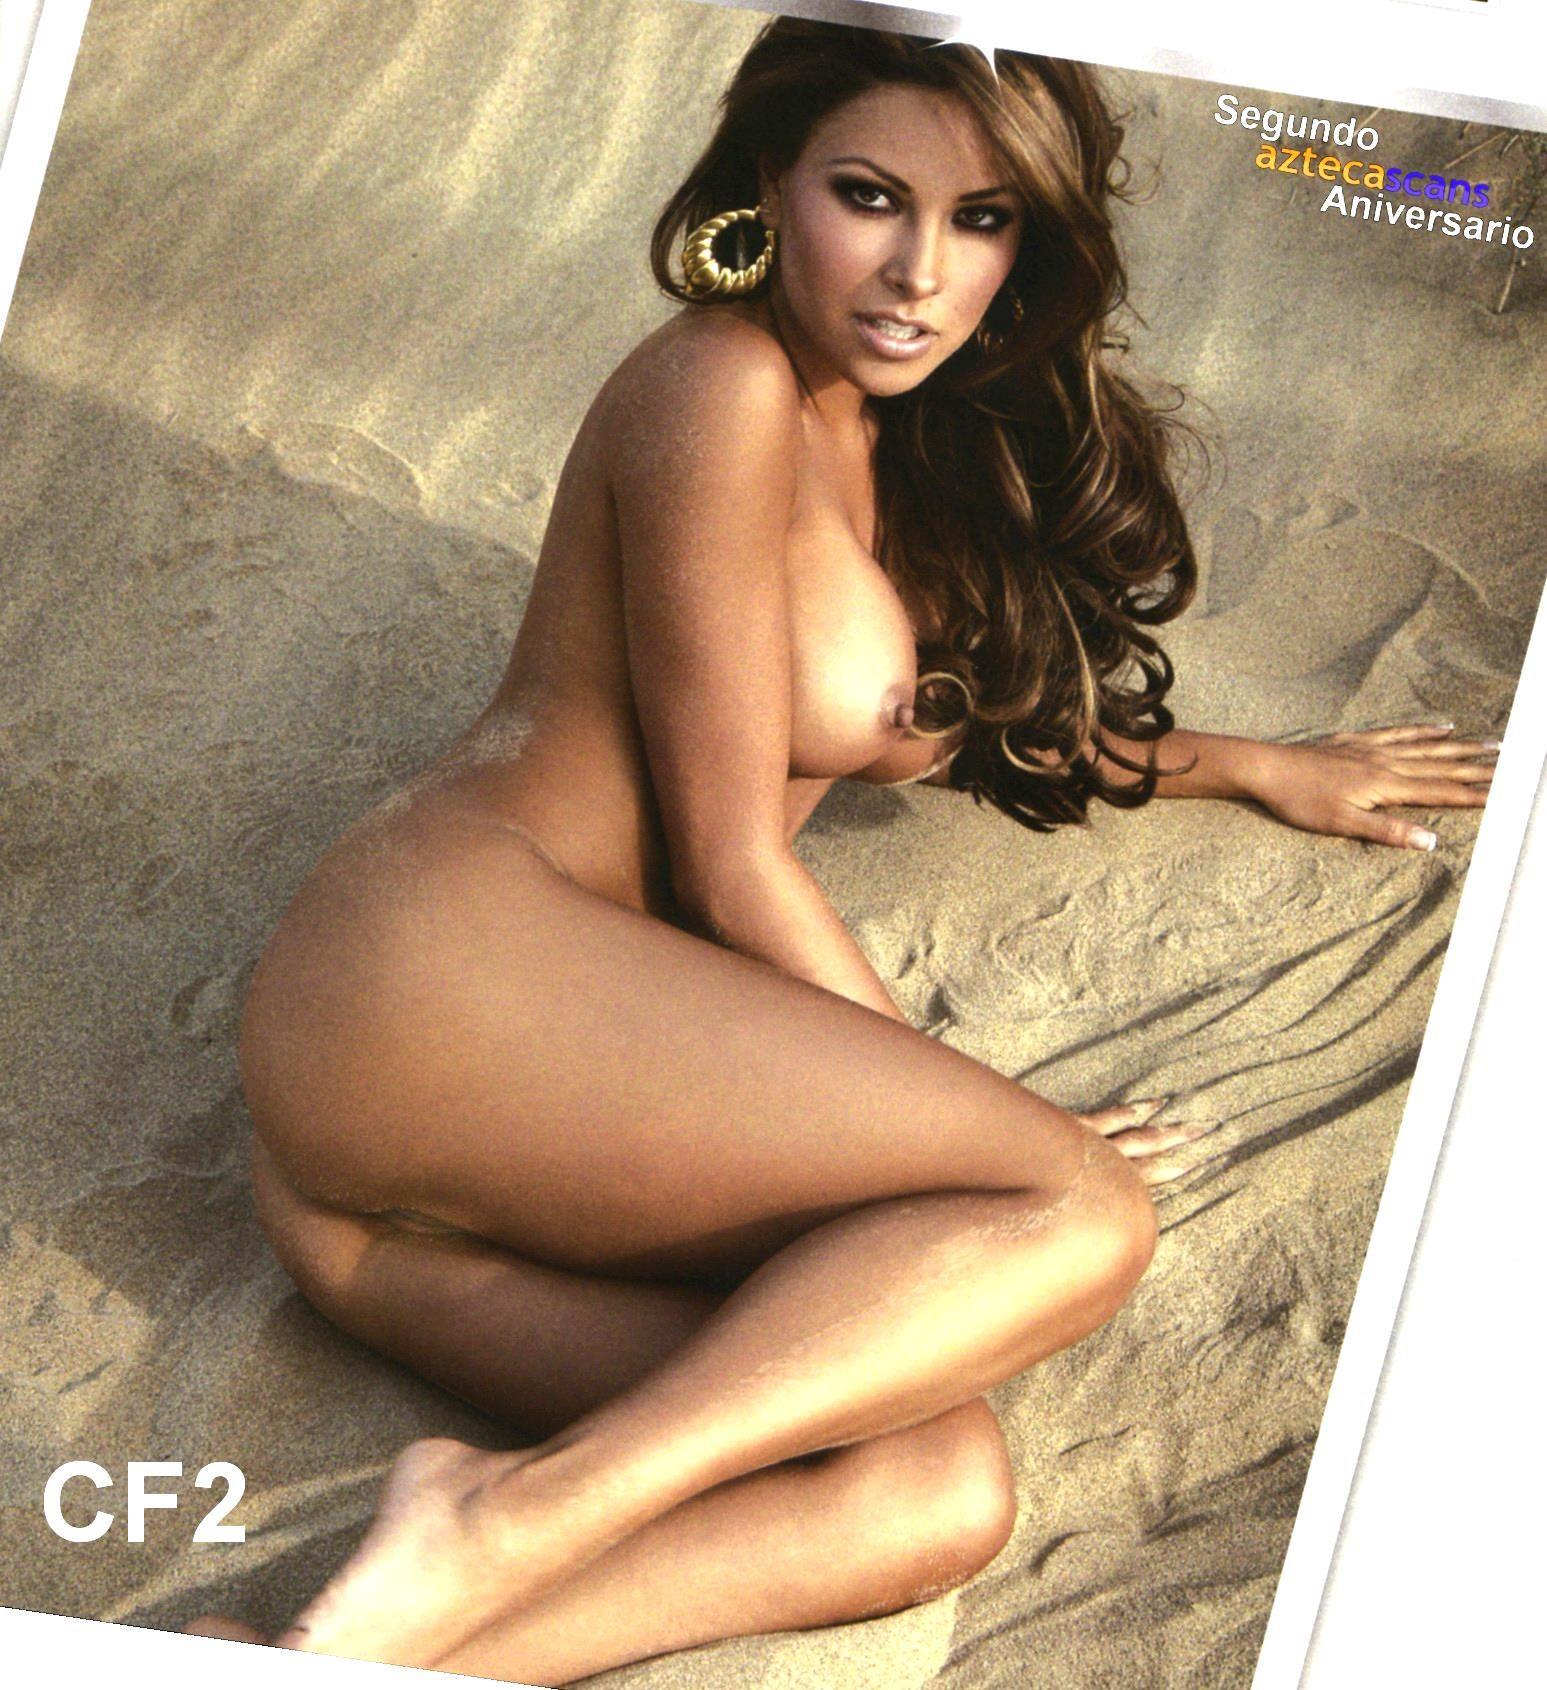 Download Sex Pics Gaby Ramirez Gaby Ramirez Pinterest Nude Picture Hd